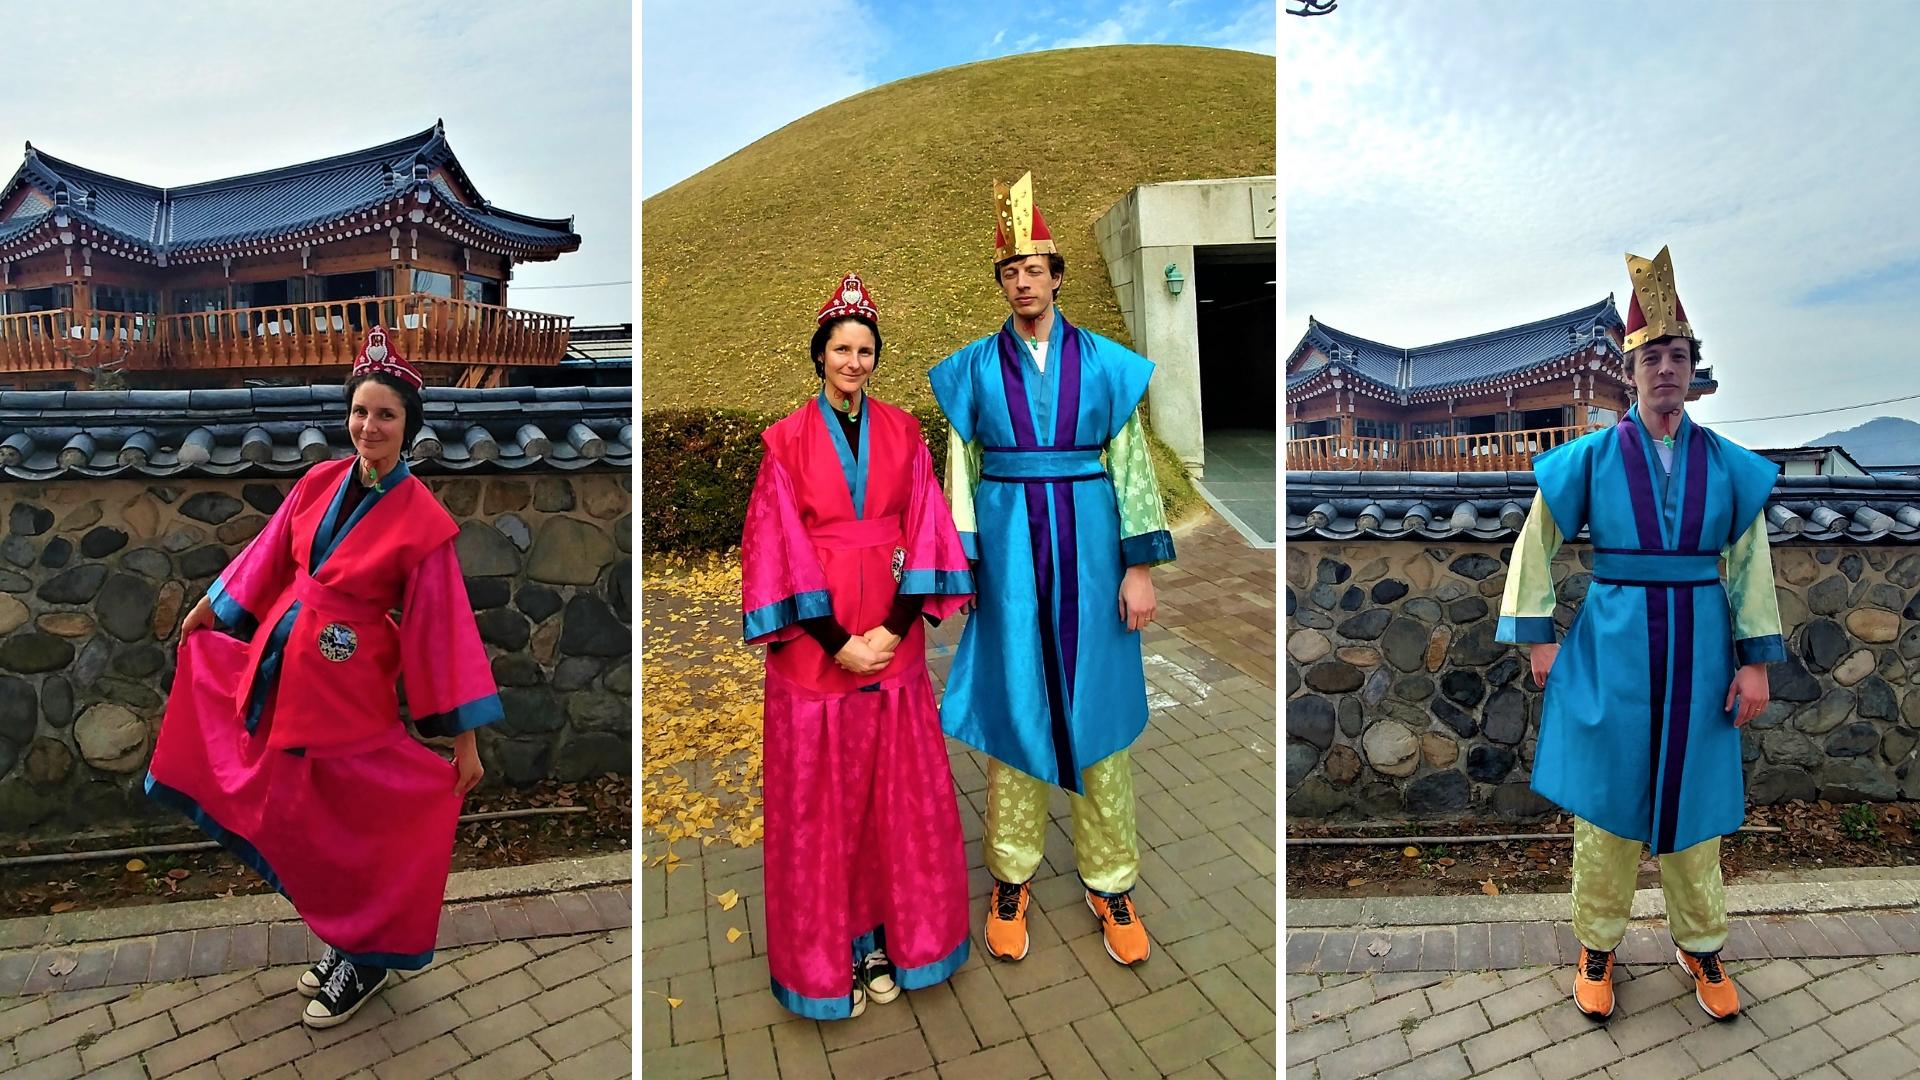 gyeongju tombes royales Cheonmachong coree voyage blog arpenter le chemin